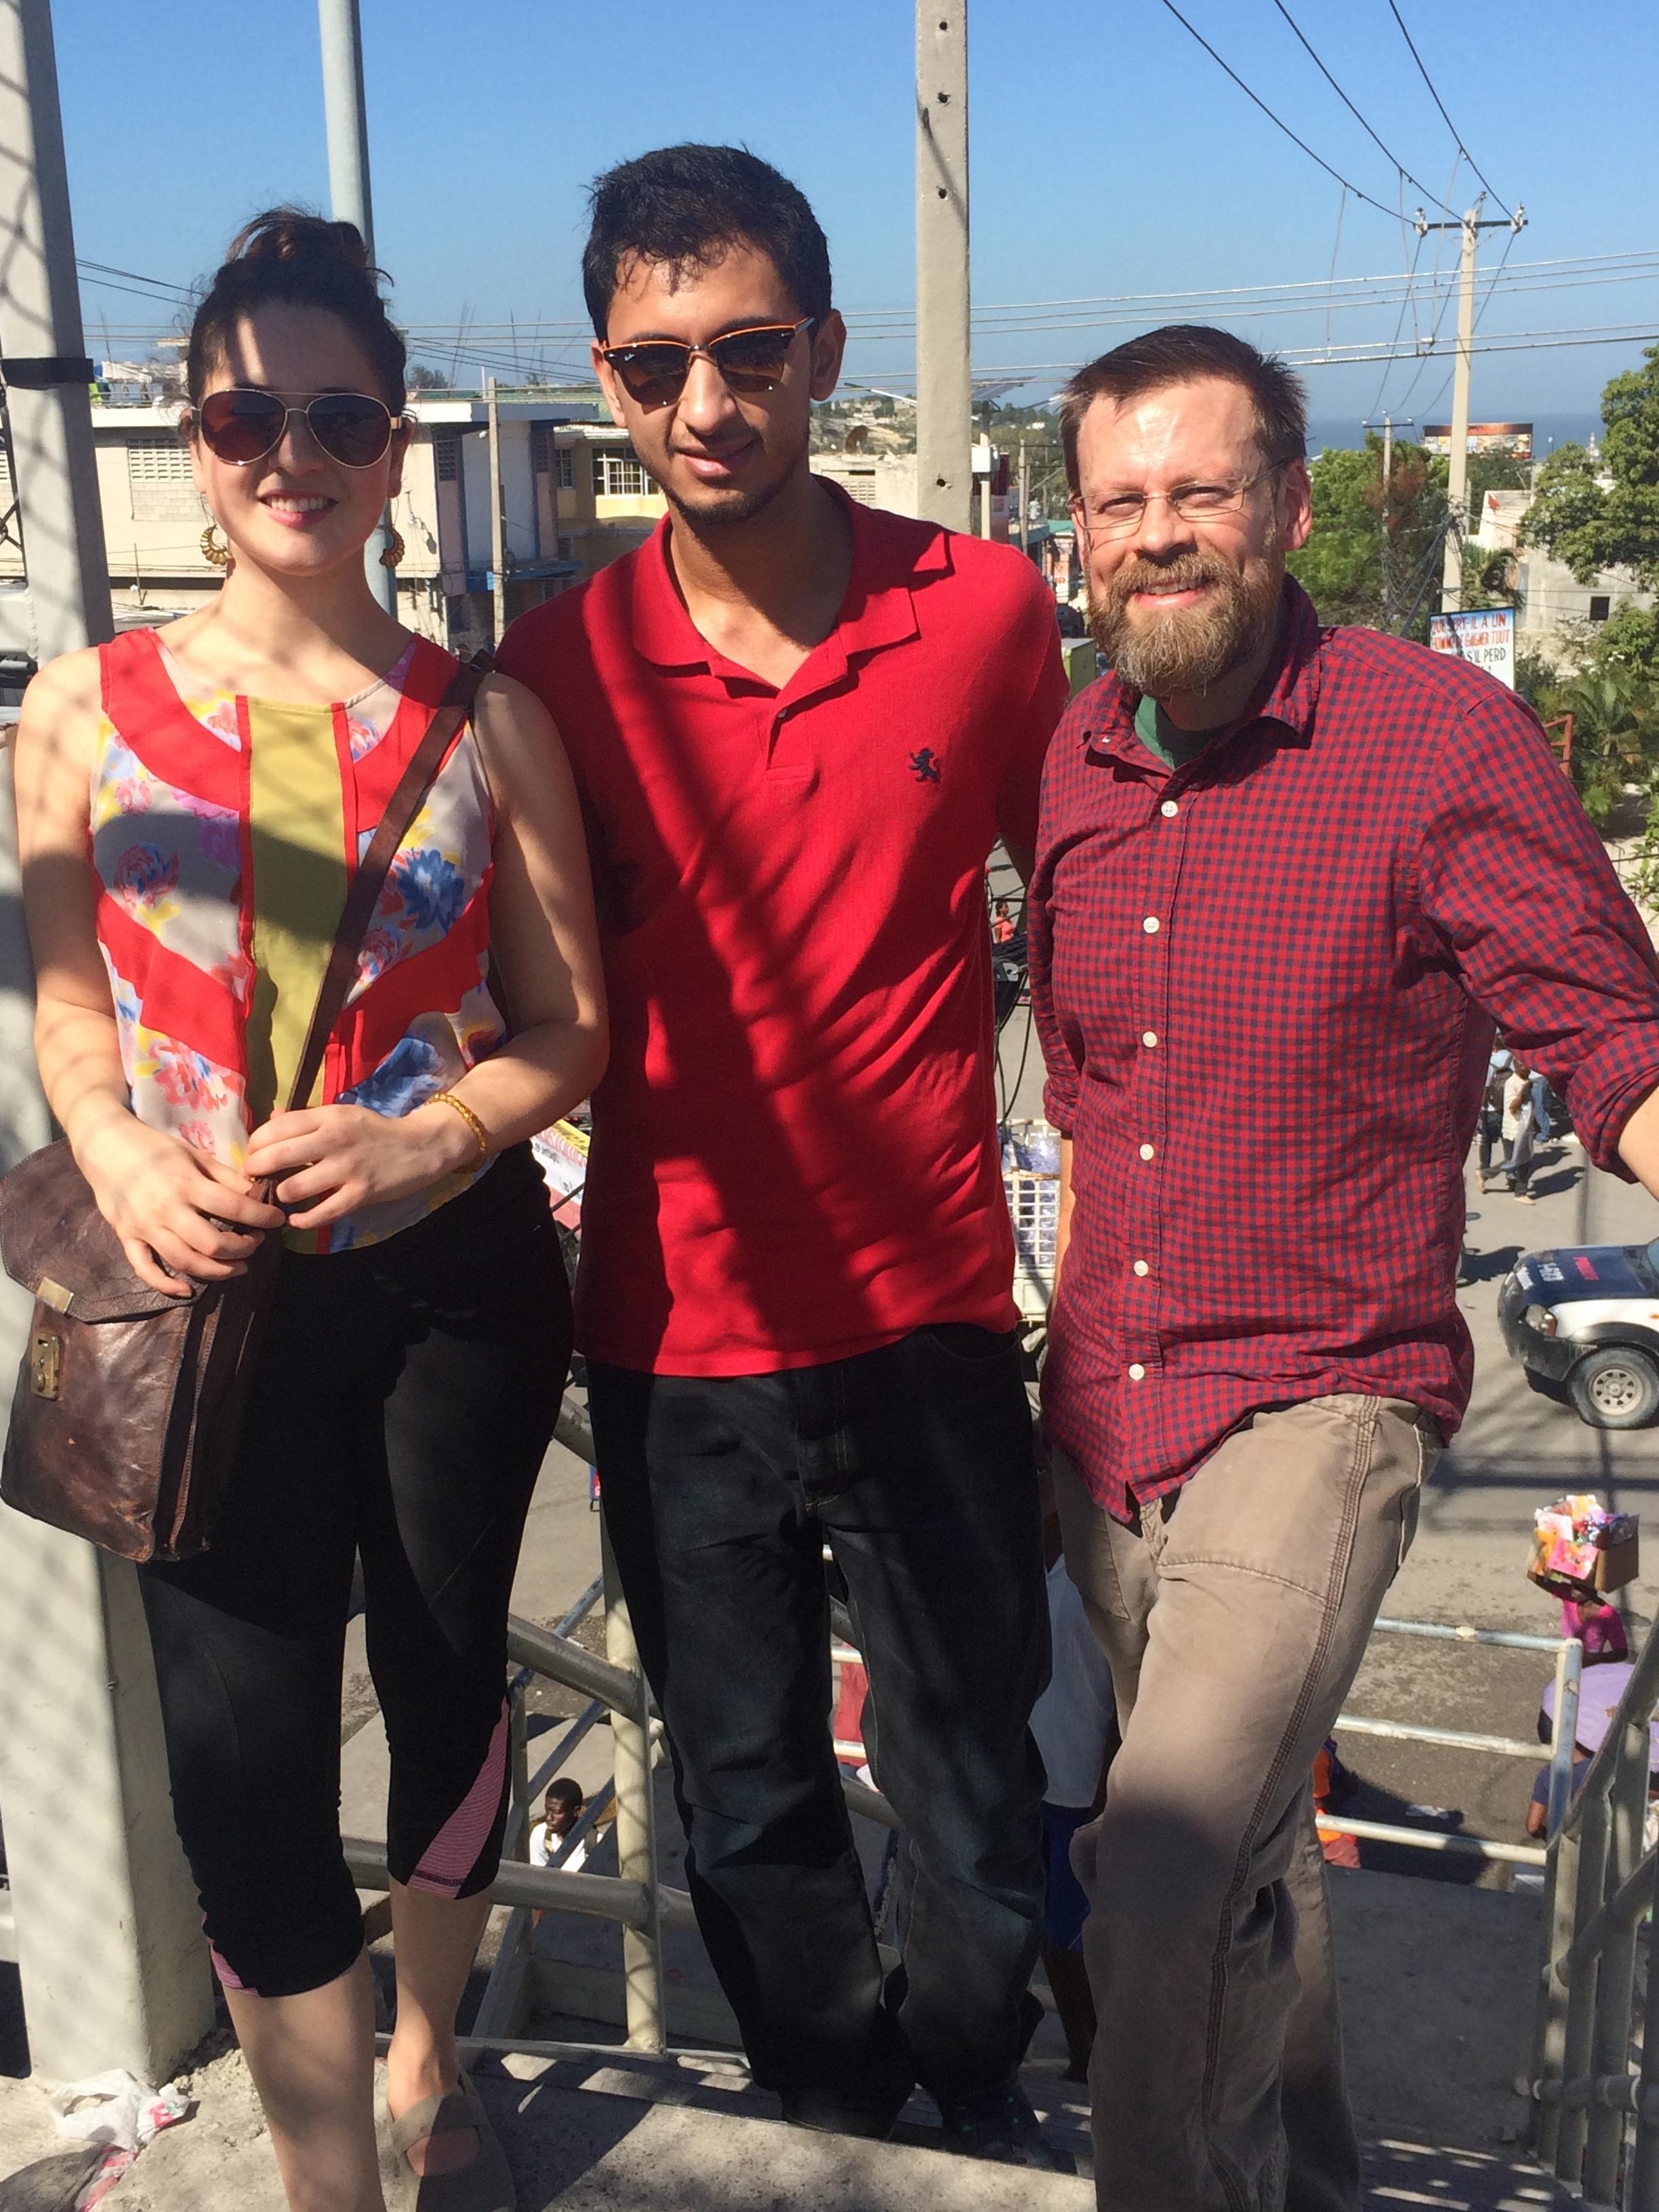 Myself, Rohail, and Daniel on our trip